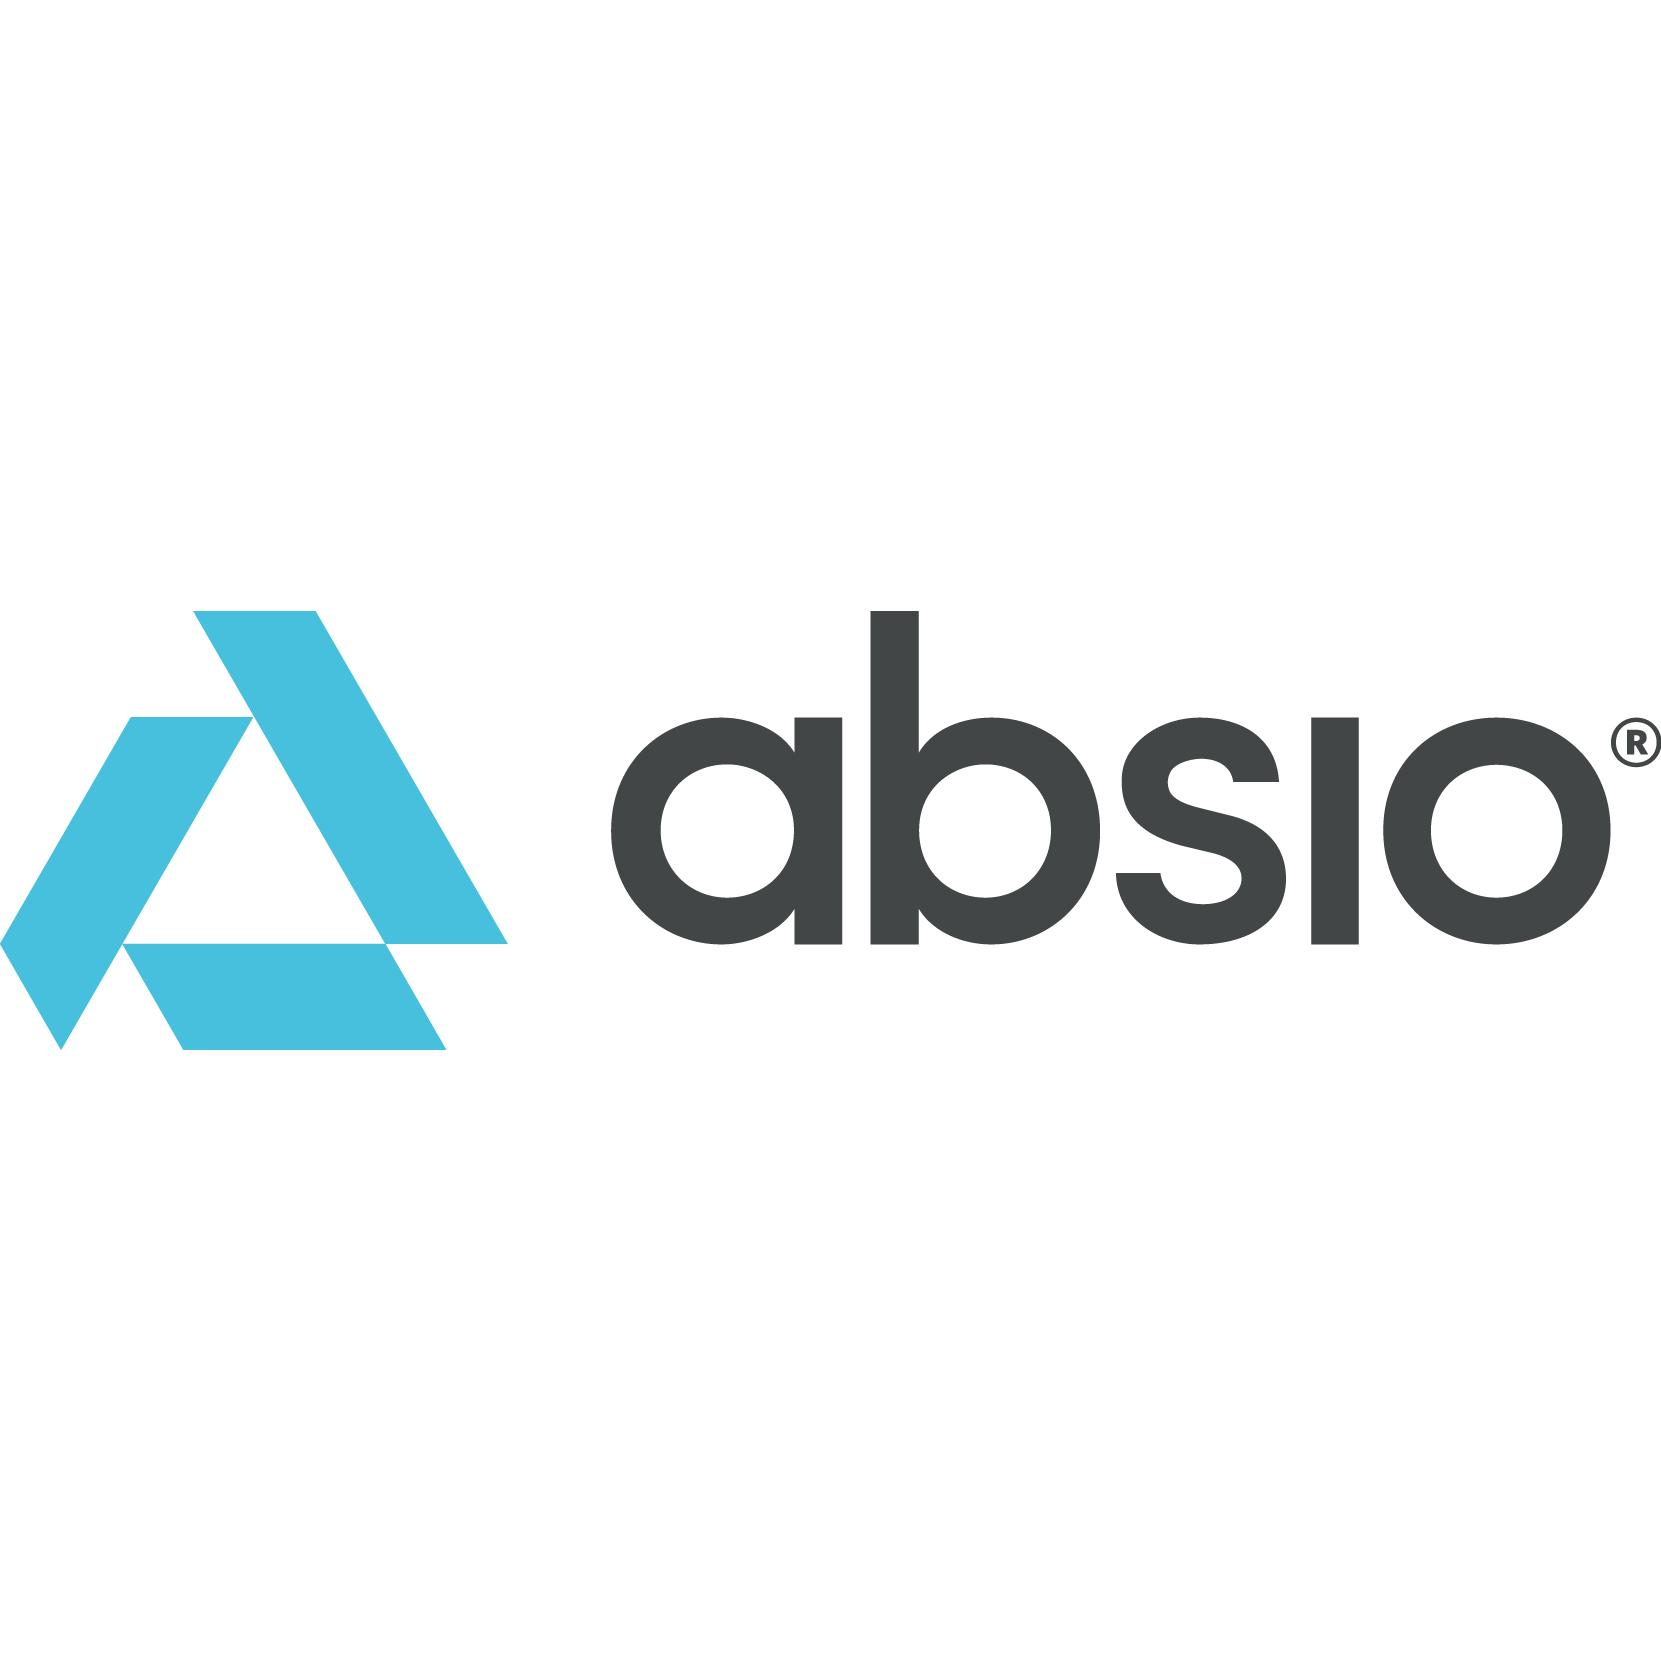 Absio Corporation